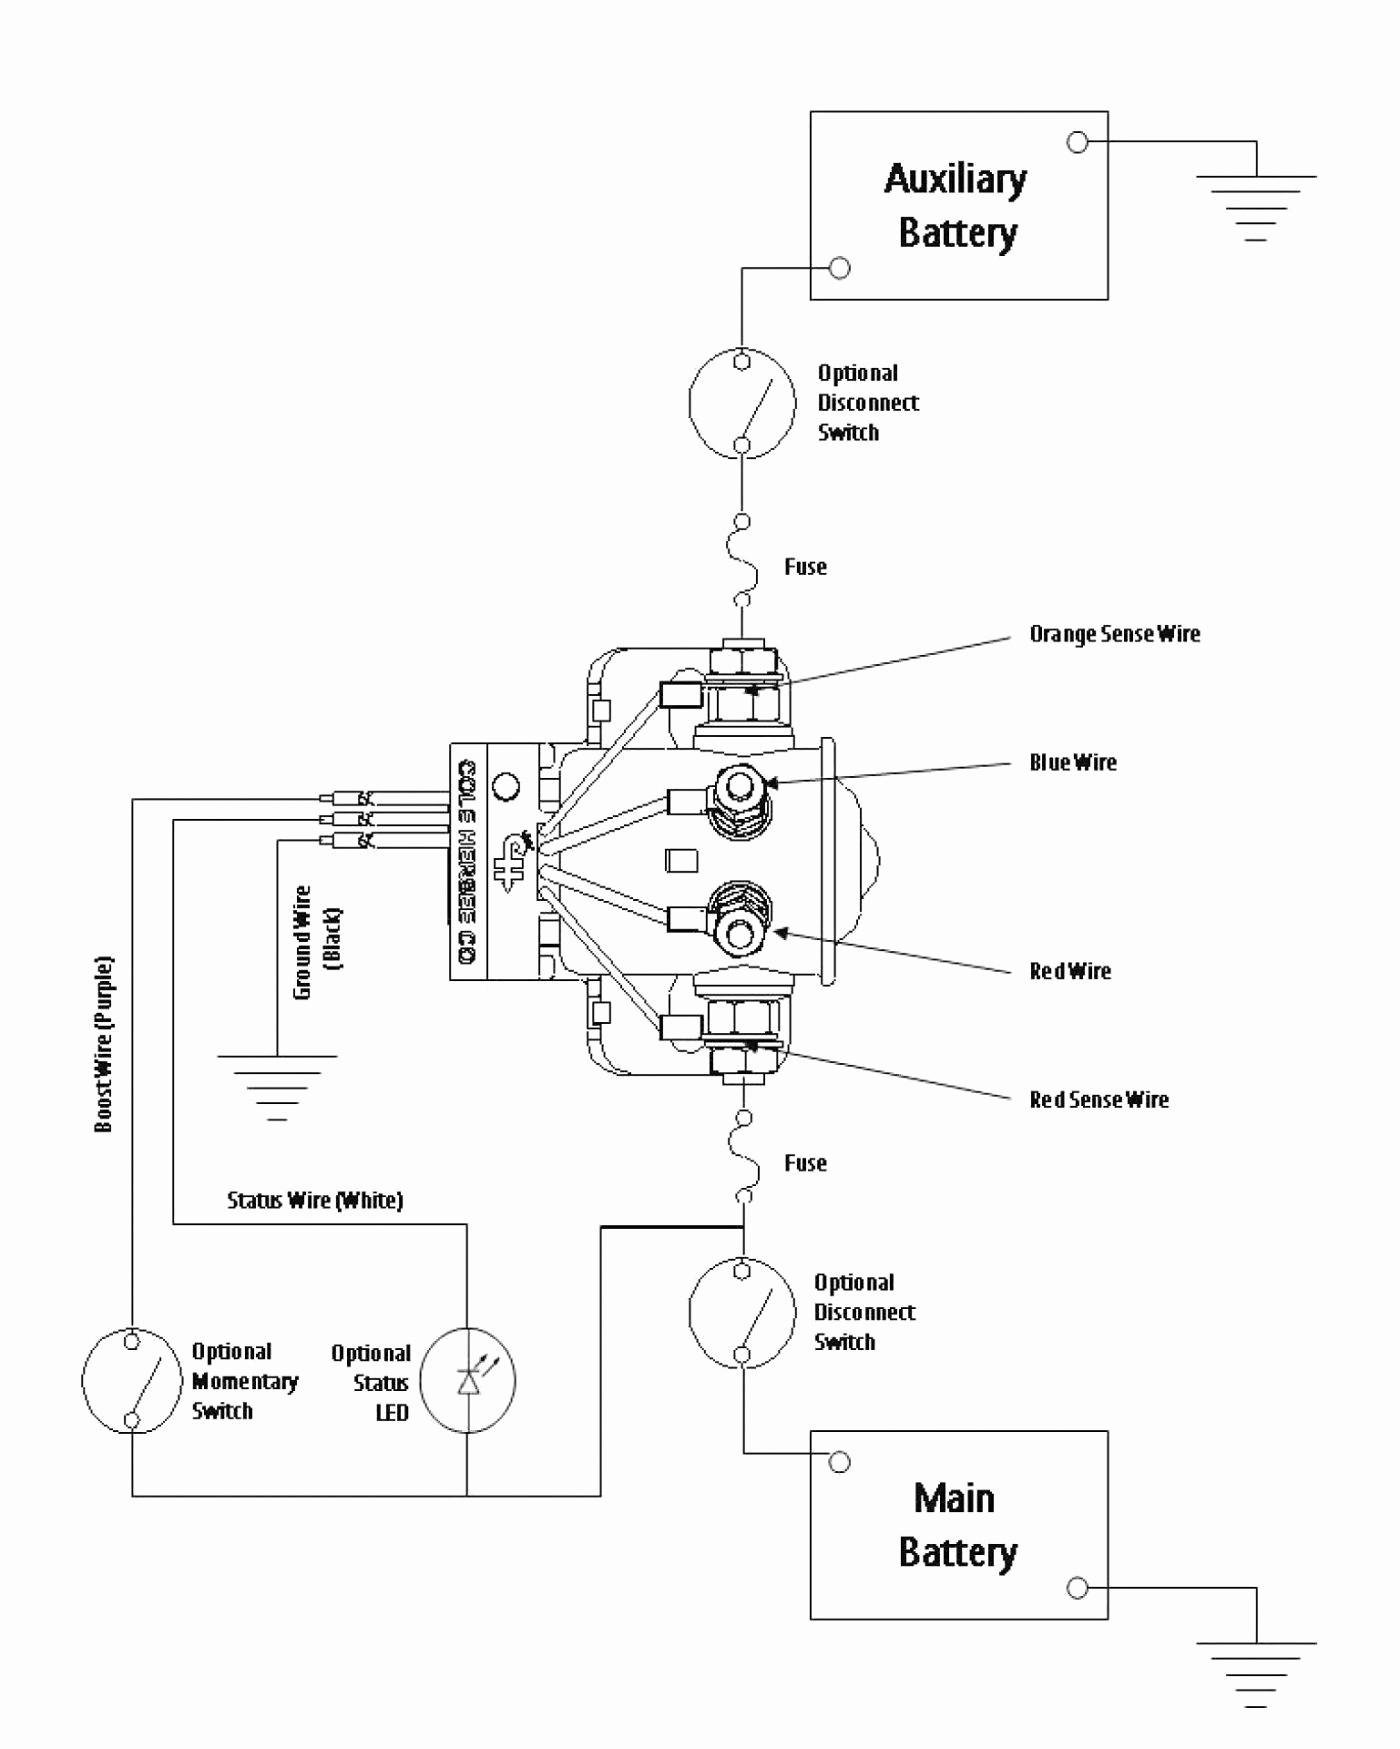 Septic Tank Float Switch Wiring Diagram Free Downloads Float Switch - Septic Tank Float Switch Wiring Diagram